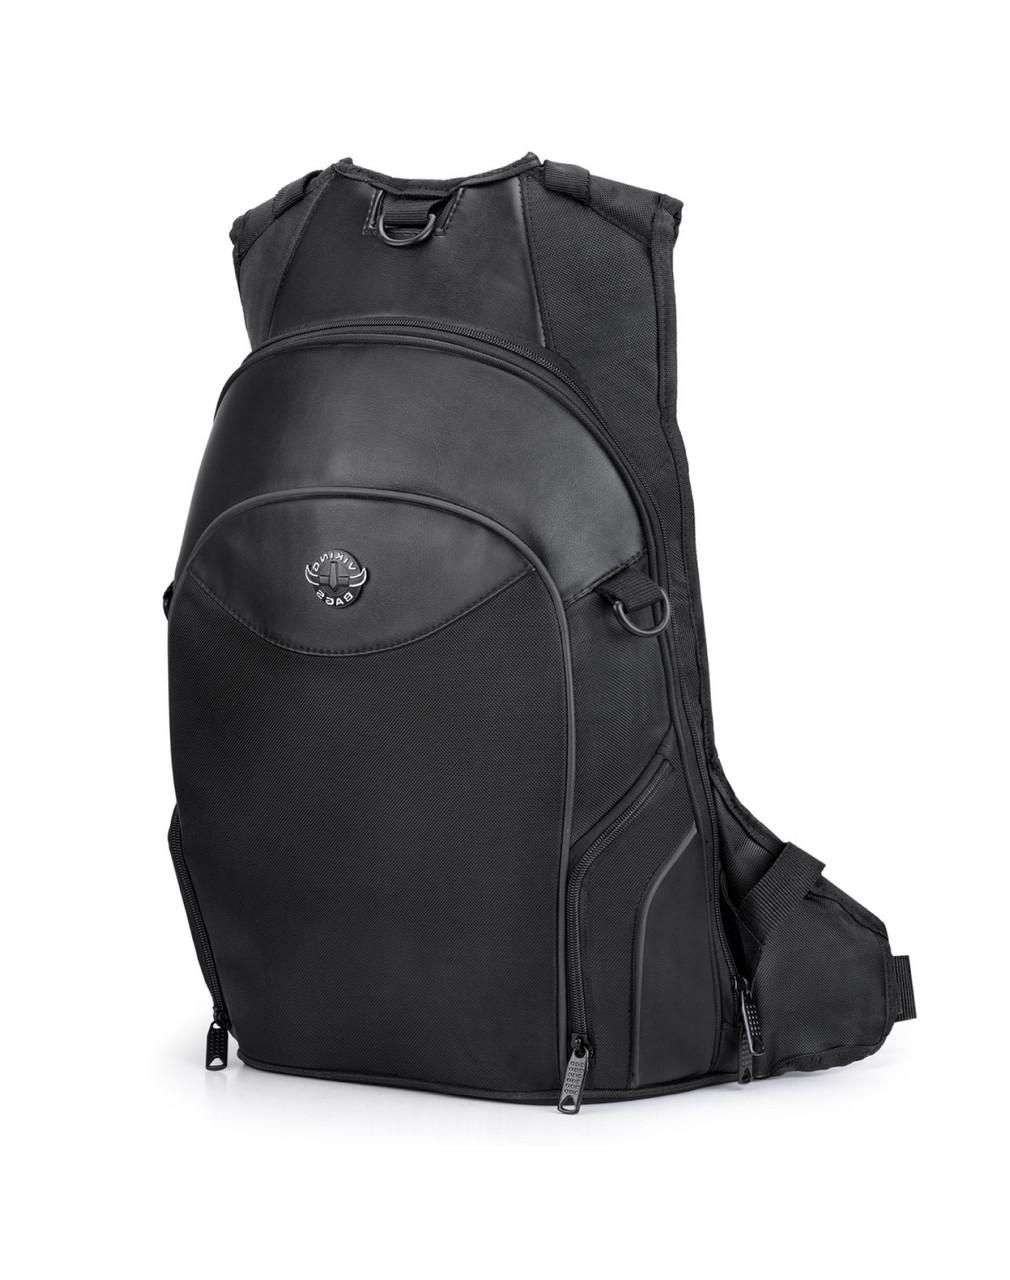 VikingBags AXE Medium Victory Motorcycle Backpack Main Bag View